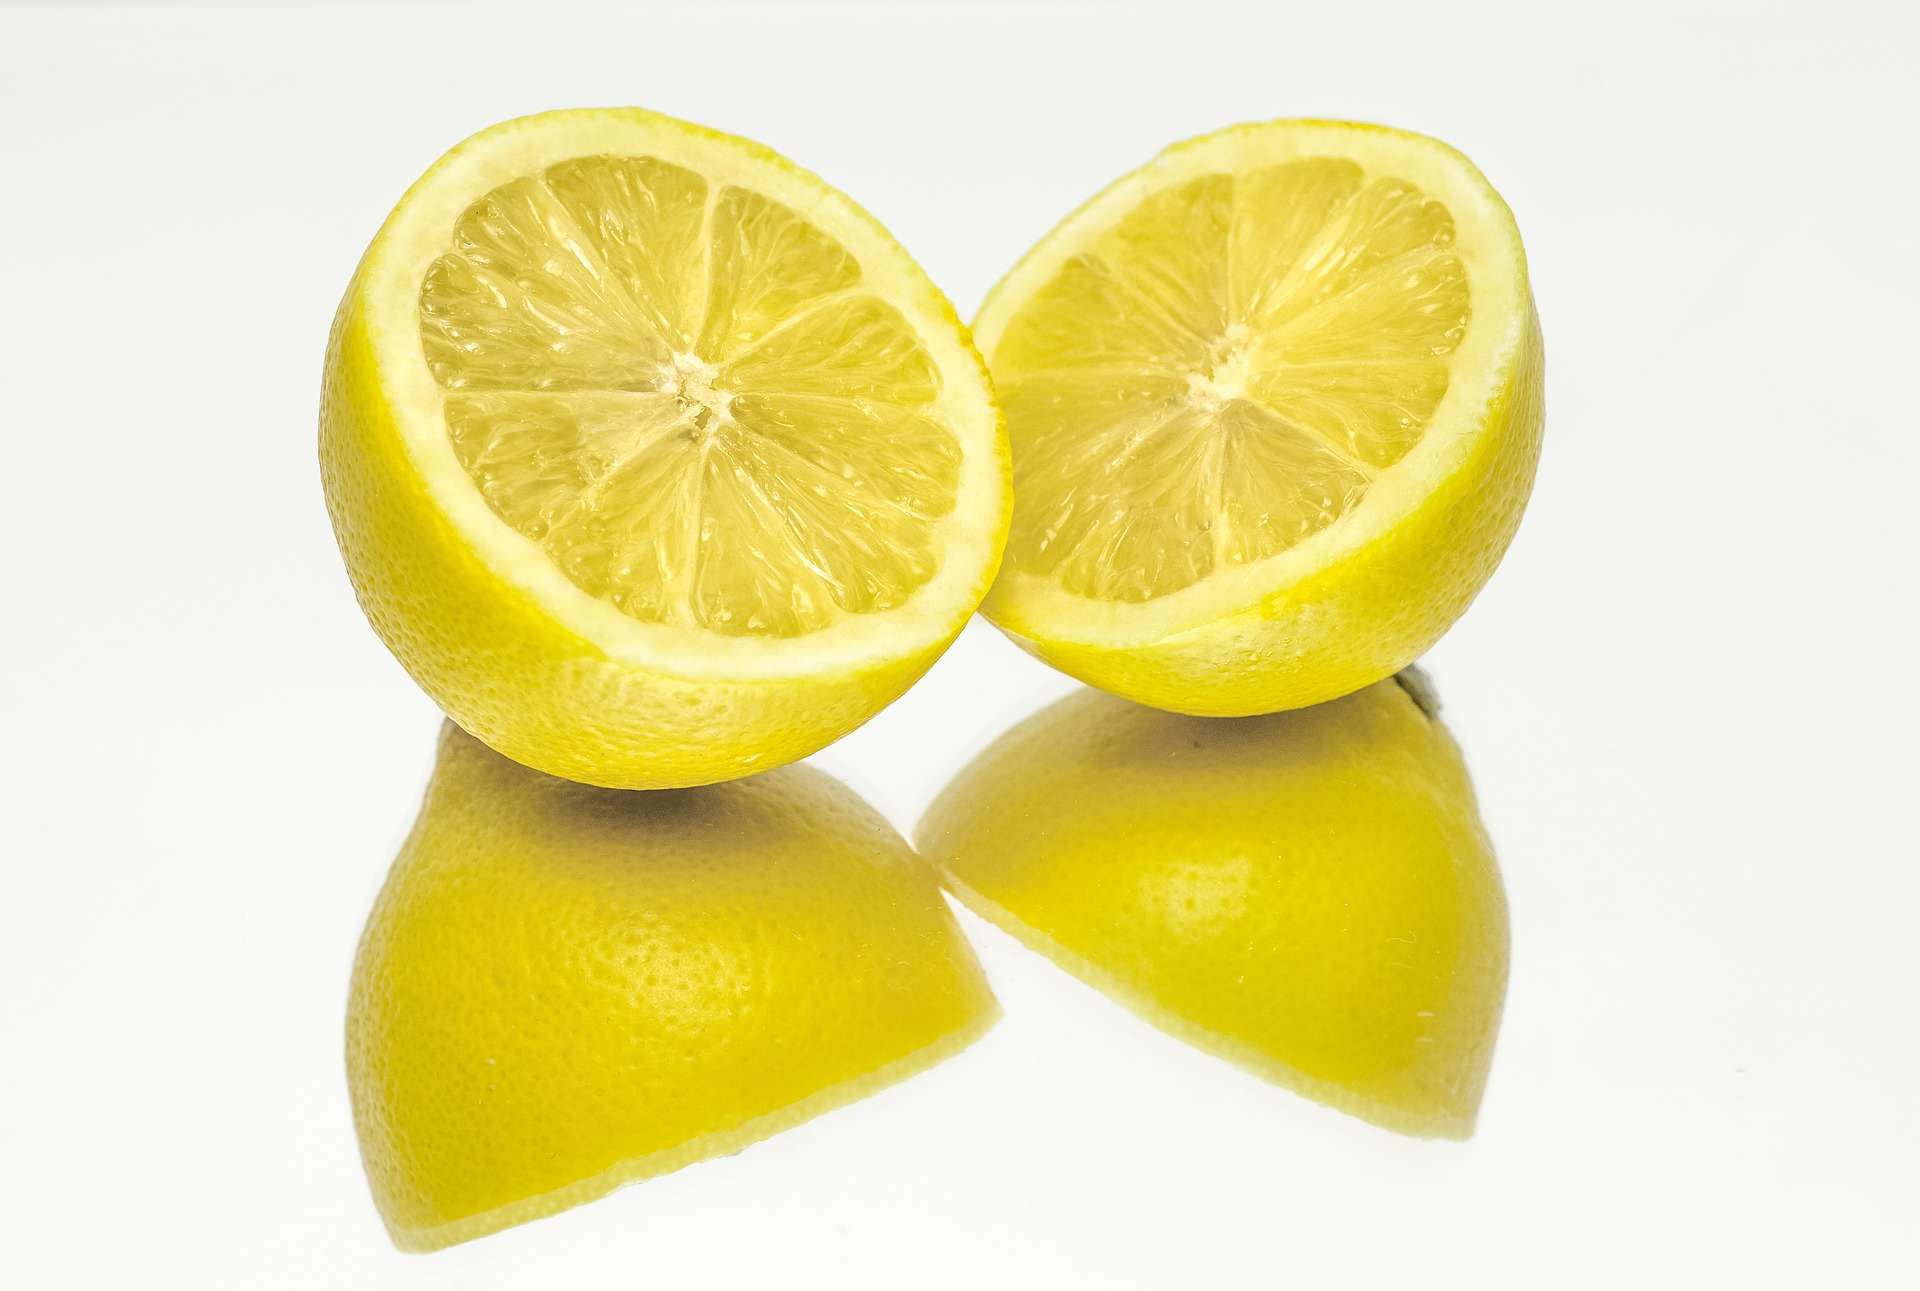 Citron šťáva